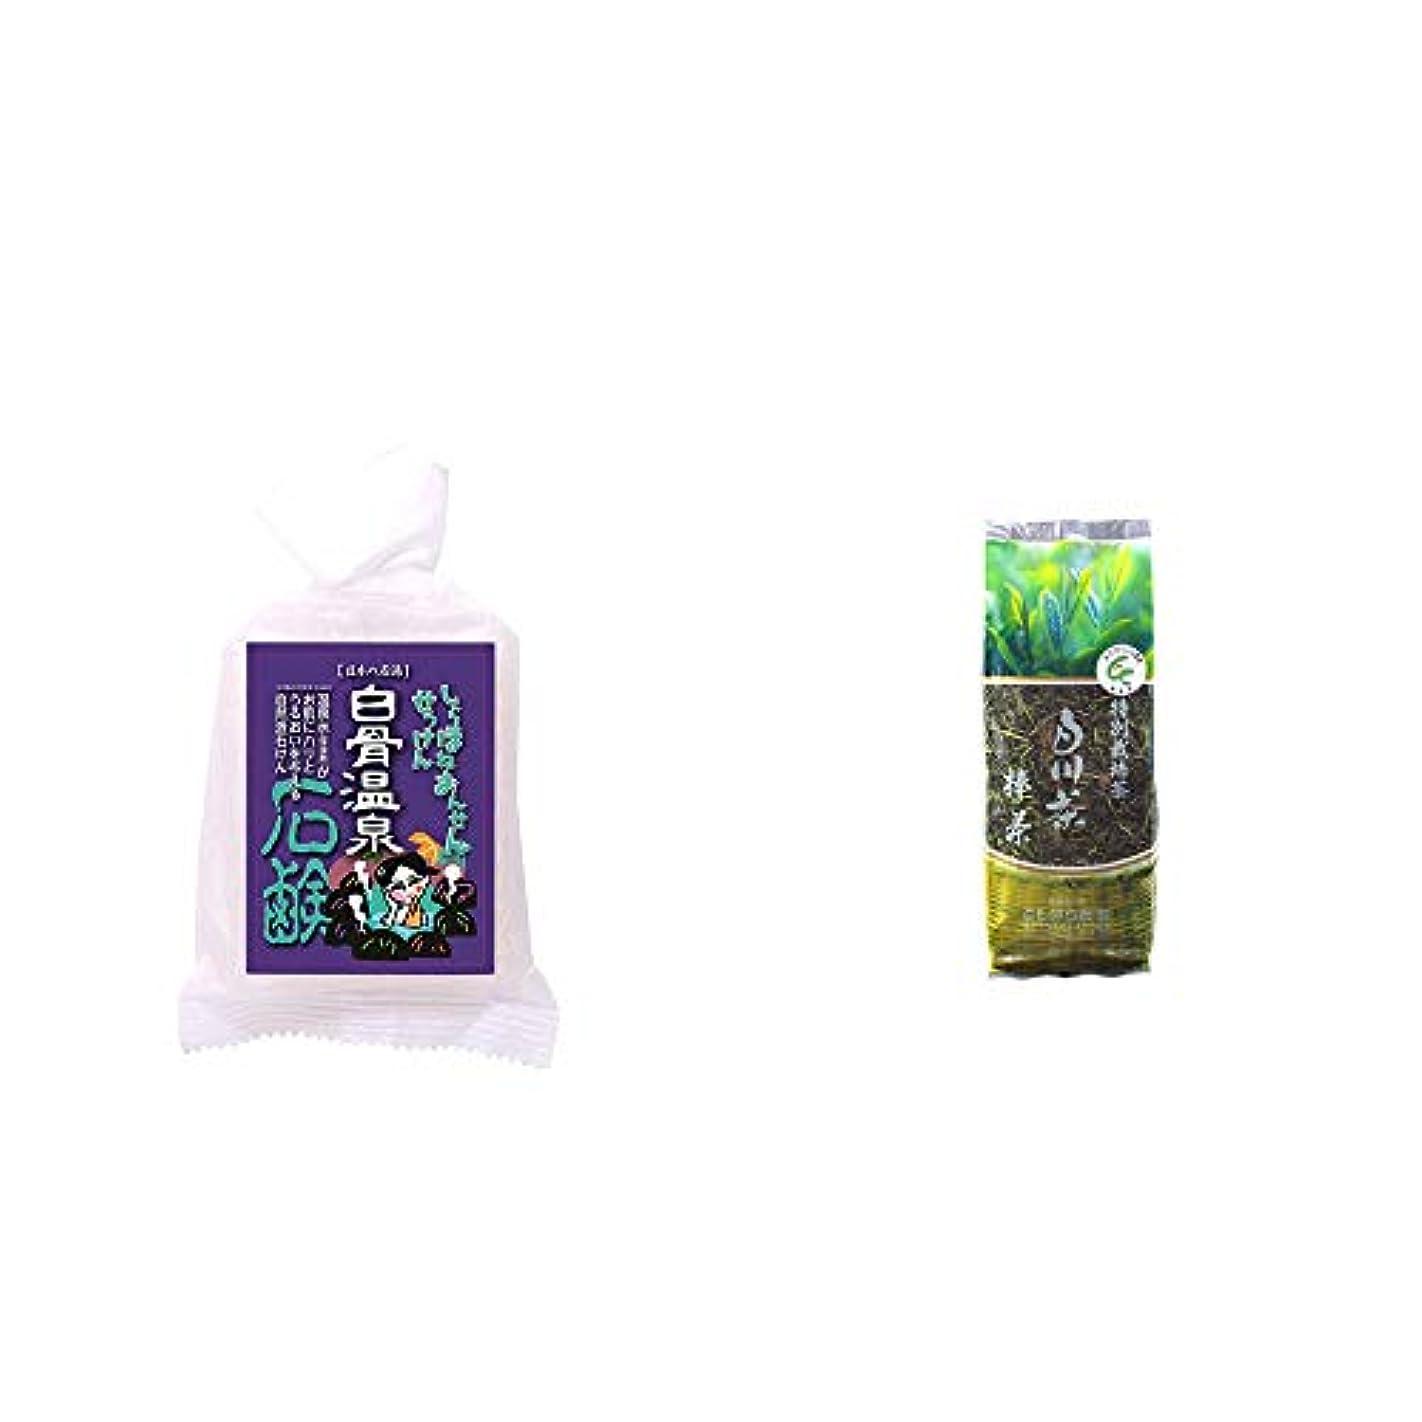 [2点セット] 信州 白骨温泉石鹸(80g)?白川茶 特別栽培茶【棒茶】(150g)